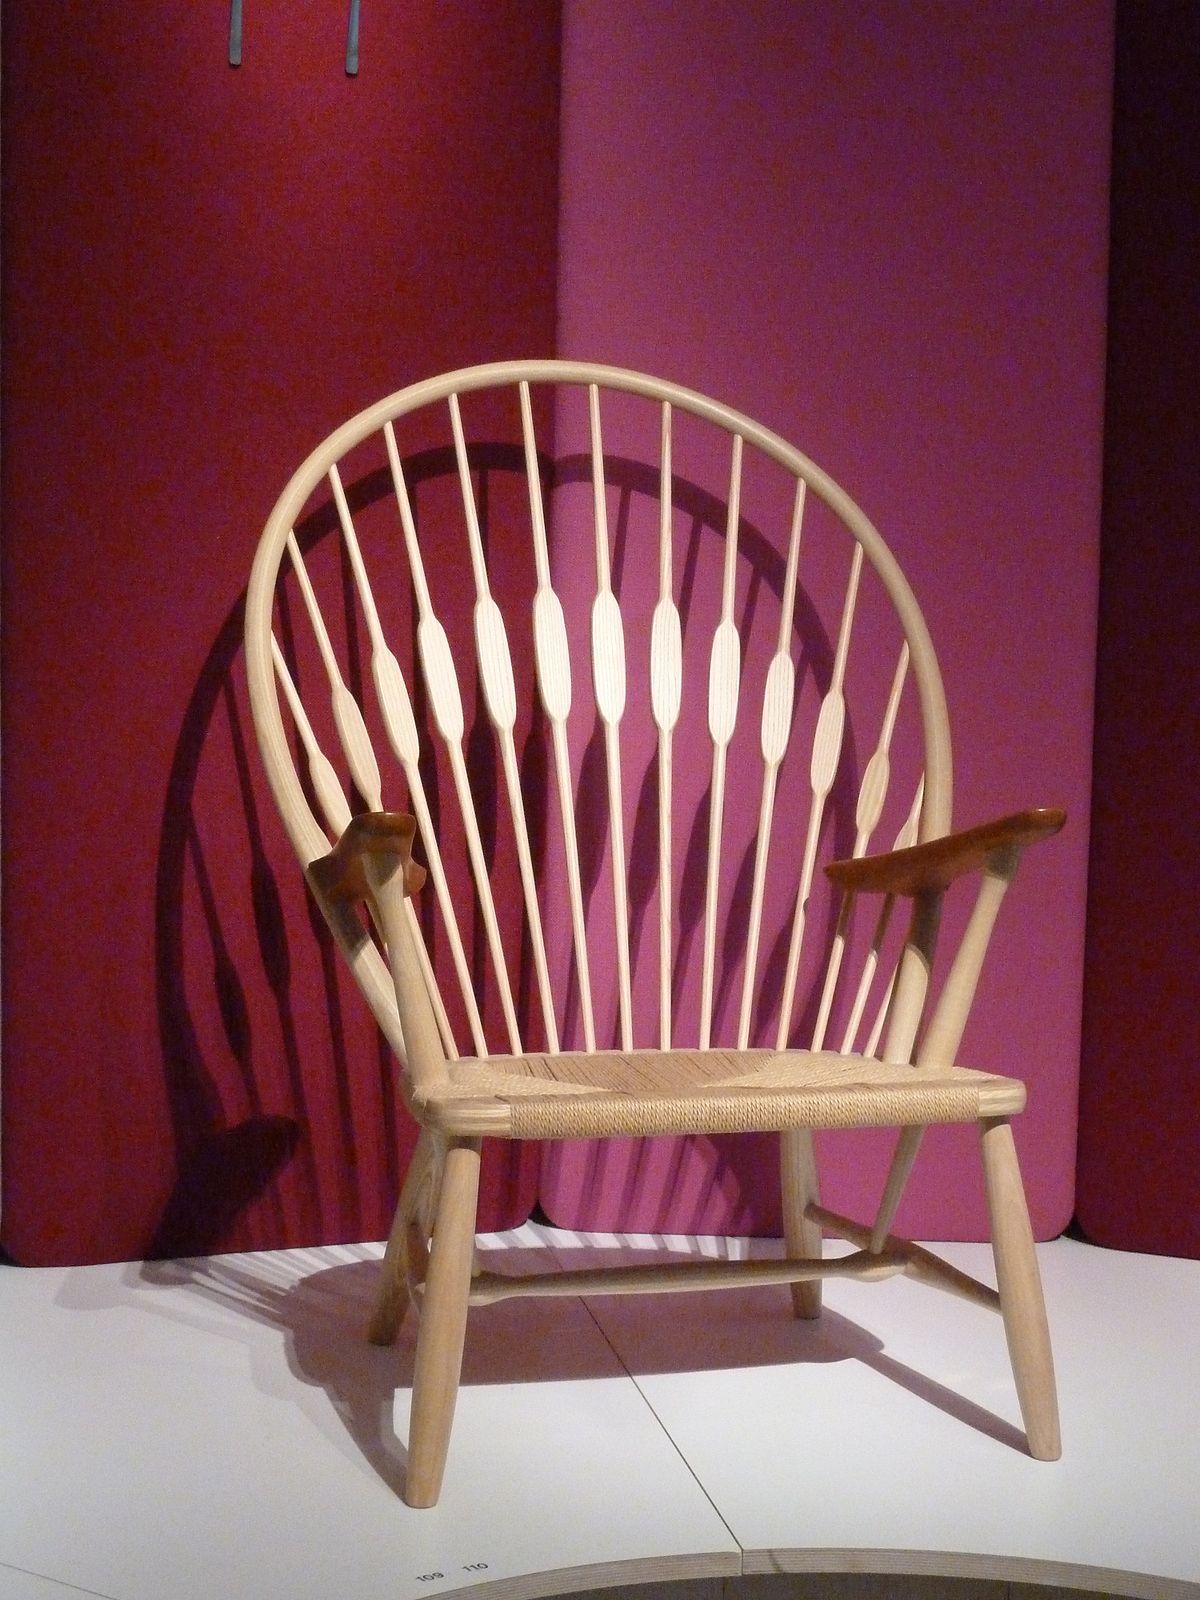 hans j wegner wikipedia. Black Bedroom Furniture Sets. Home Design Ideas